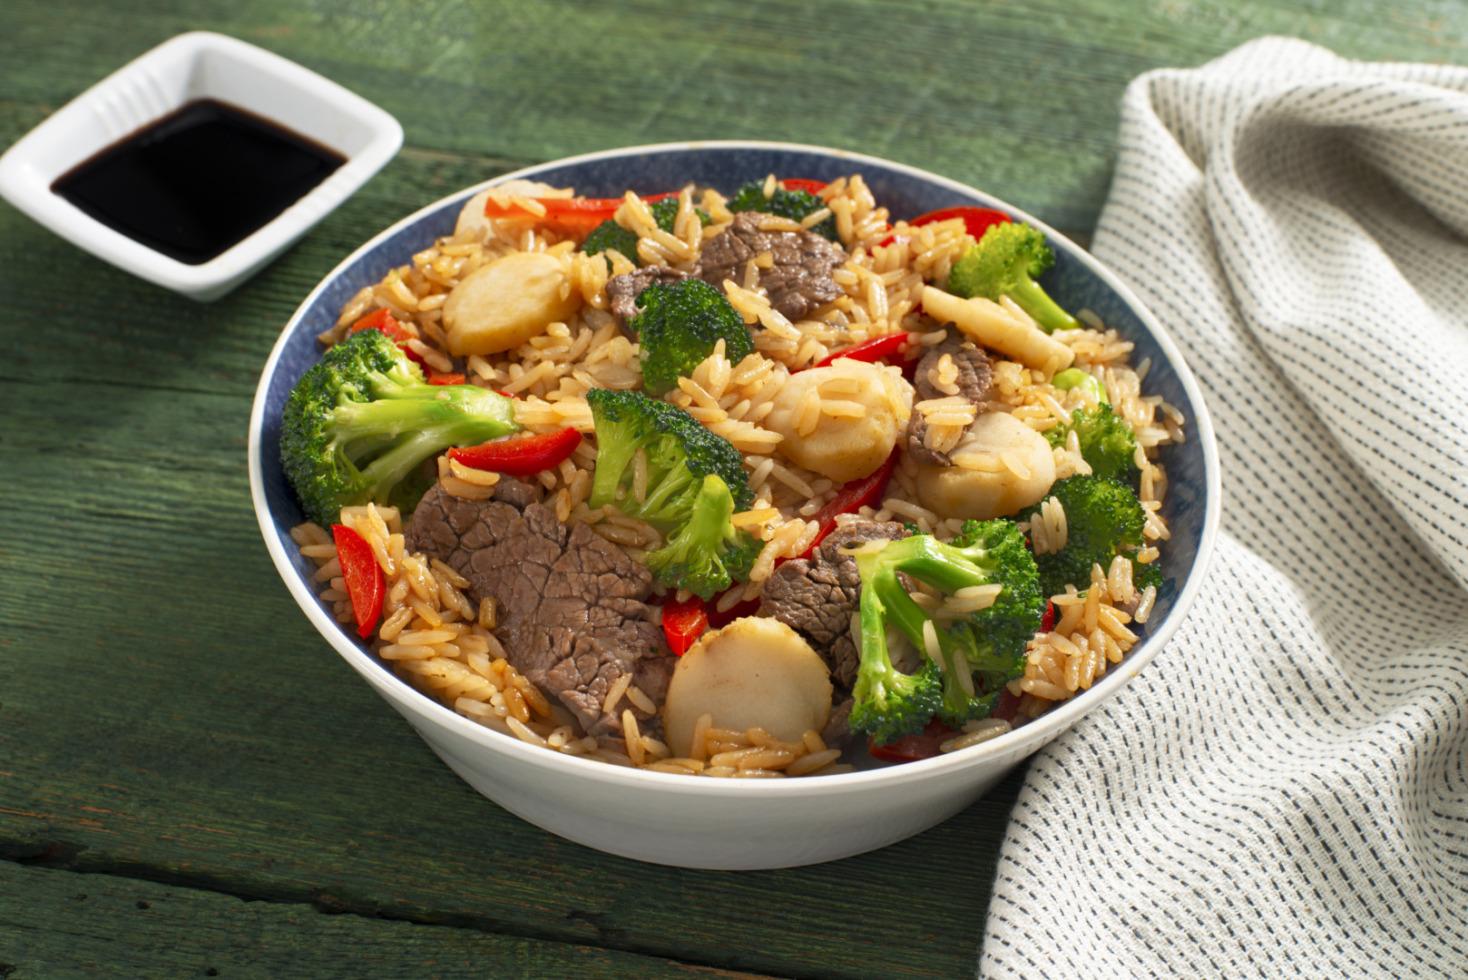 Beef and Broccoli Garlic Rice